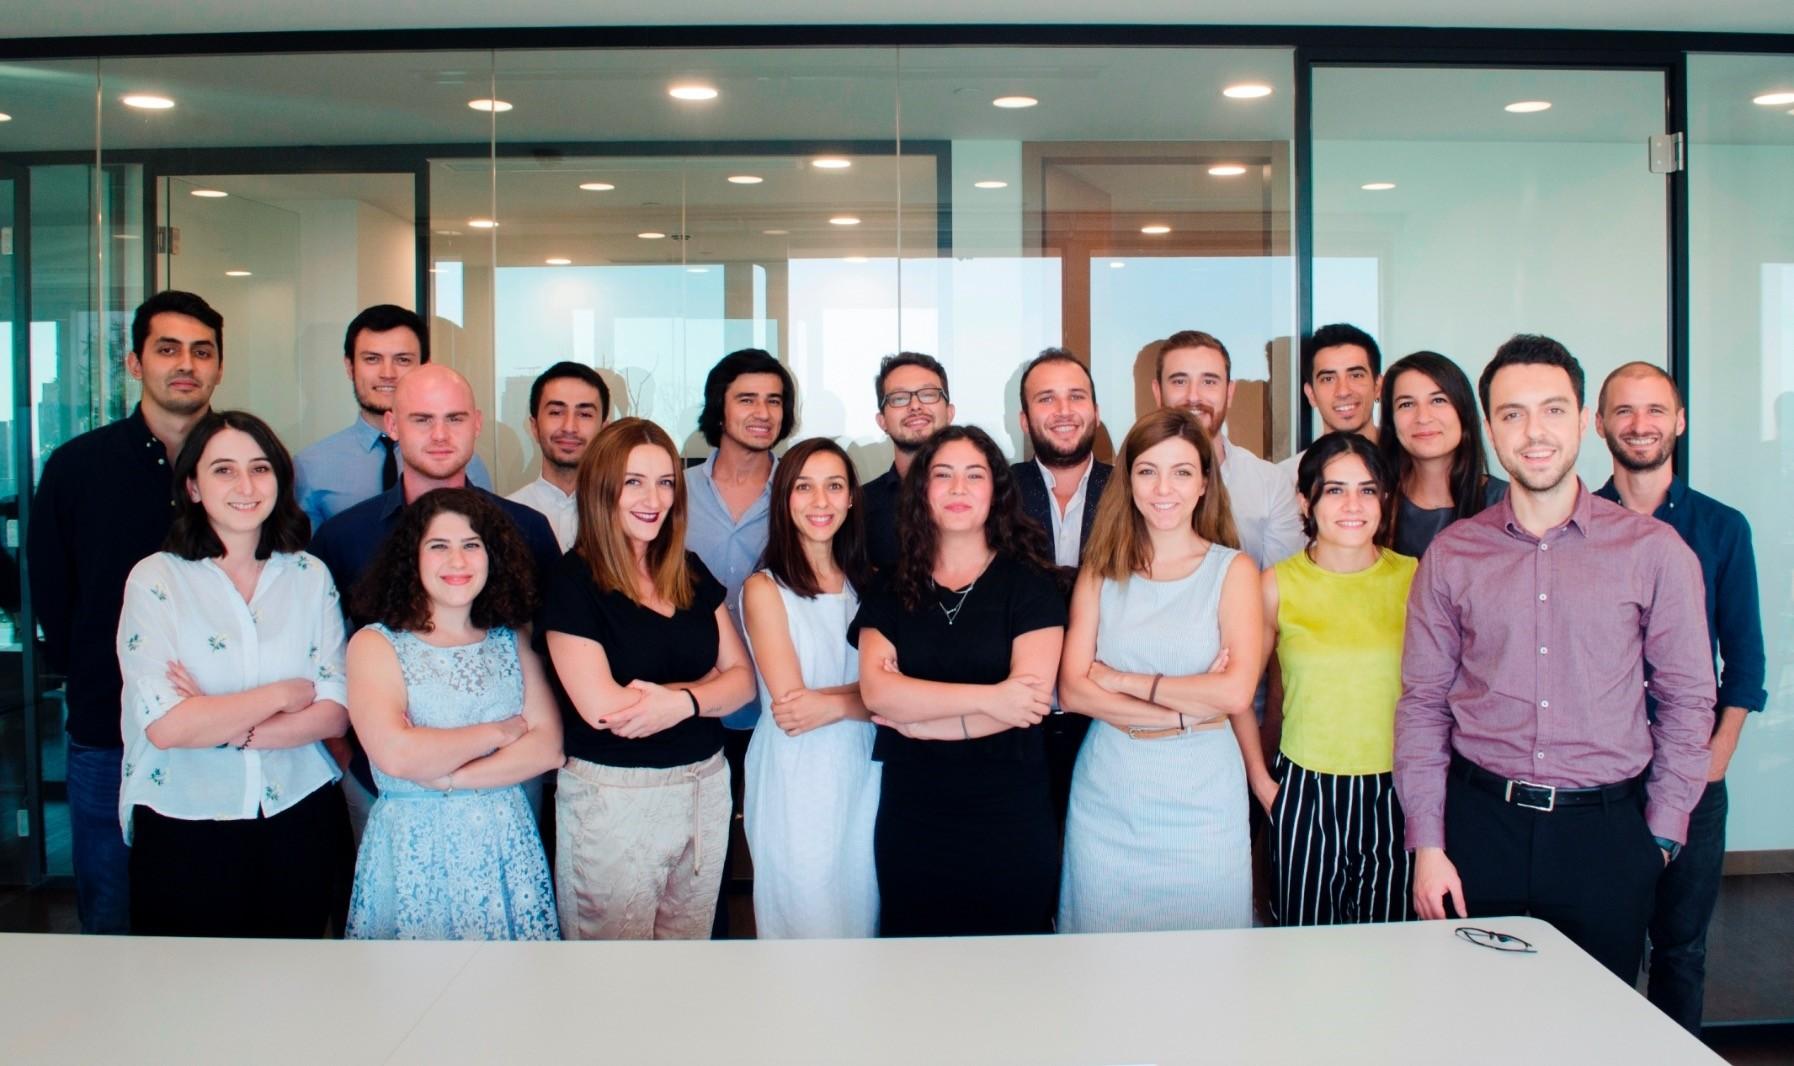 Team members of the customer experience management platform, Pisano.